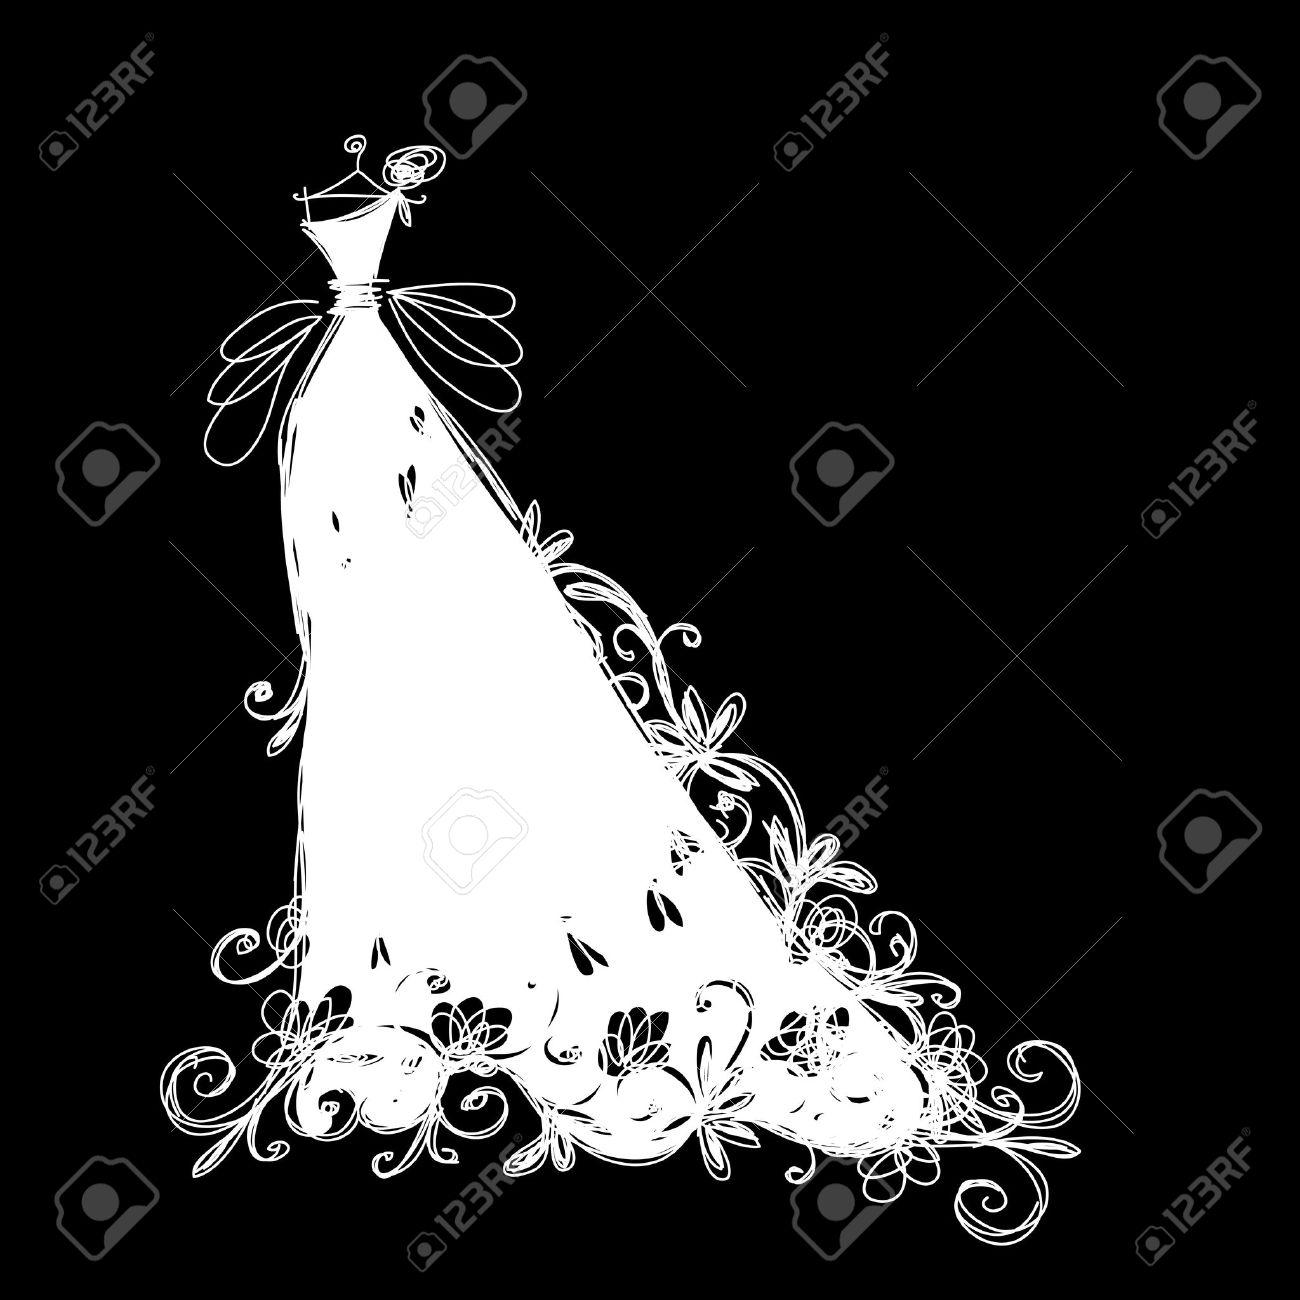 Sketch of wedding dress for your design - 16683283